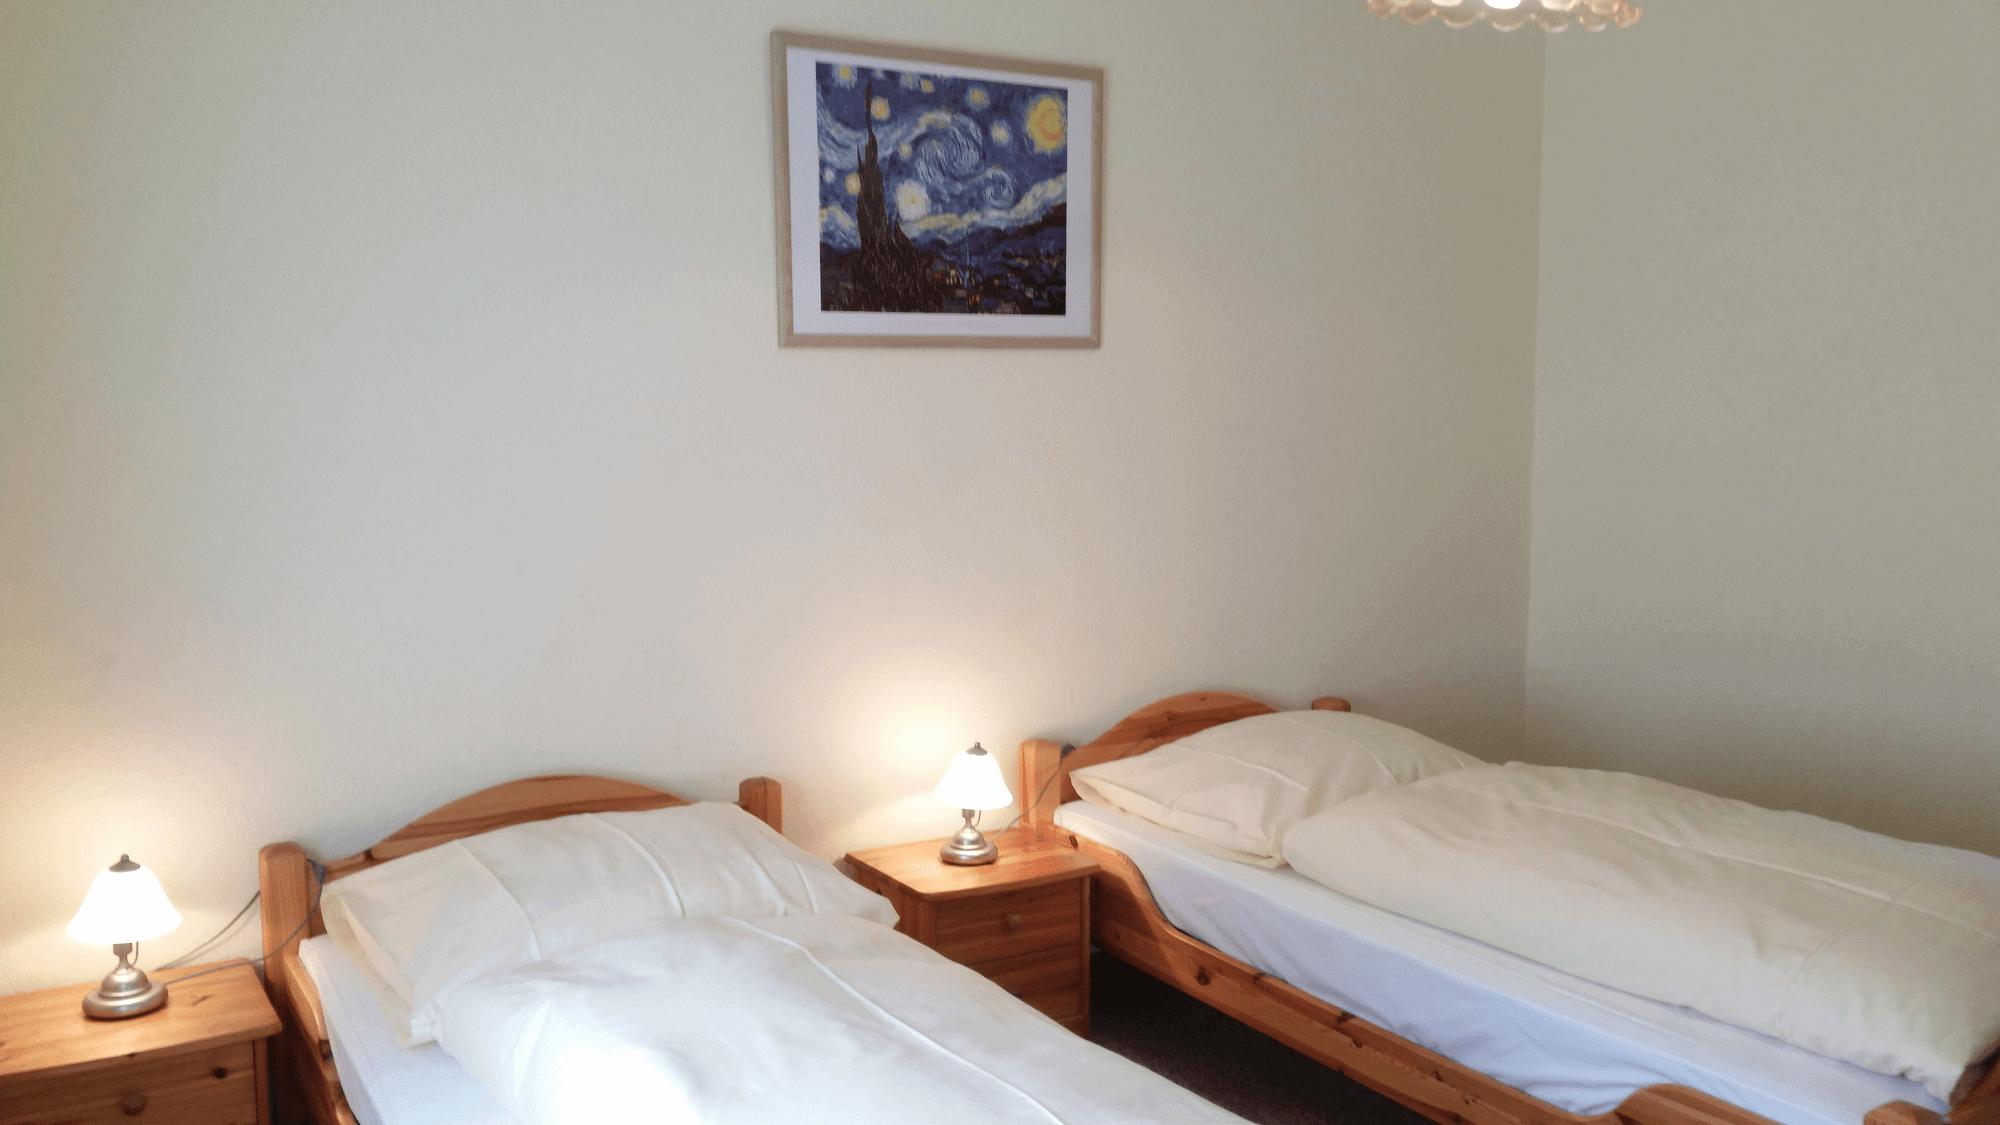 Adenau: Berghotel & Restaurant Hohe Acht